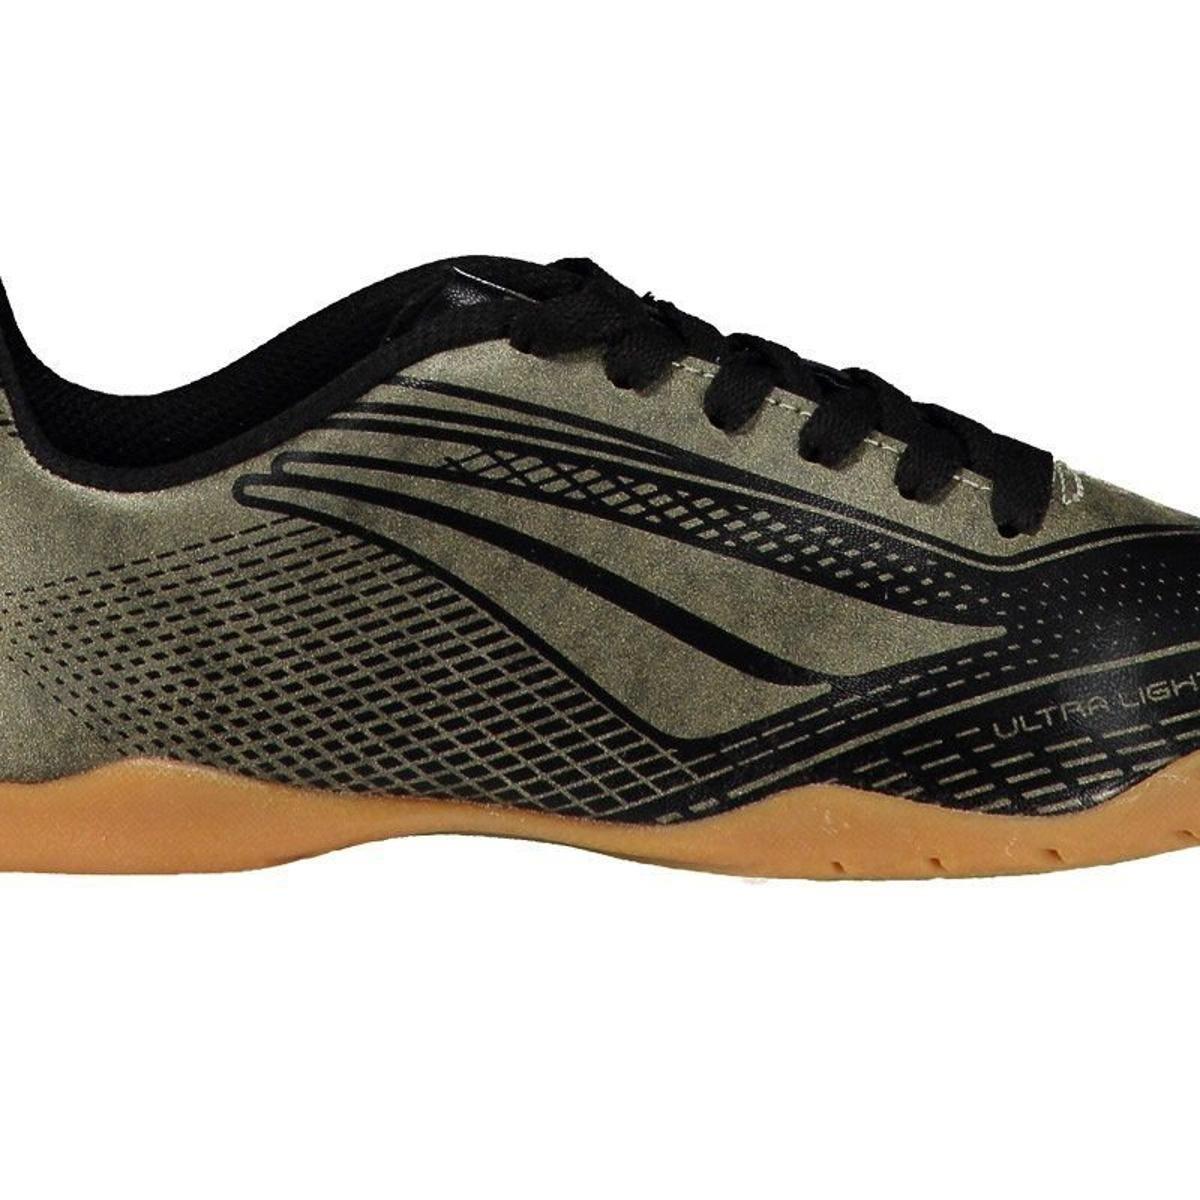 9f3967e3d2 Chuteira Penalty Storm Speed VII Futsal Juvenil - Dourado - Compre ...